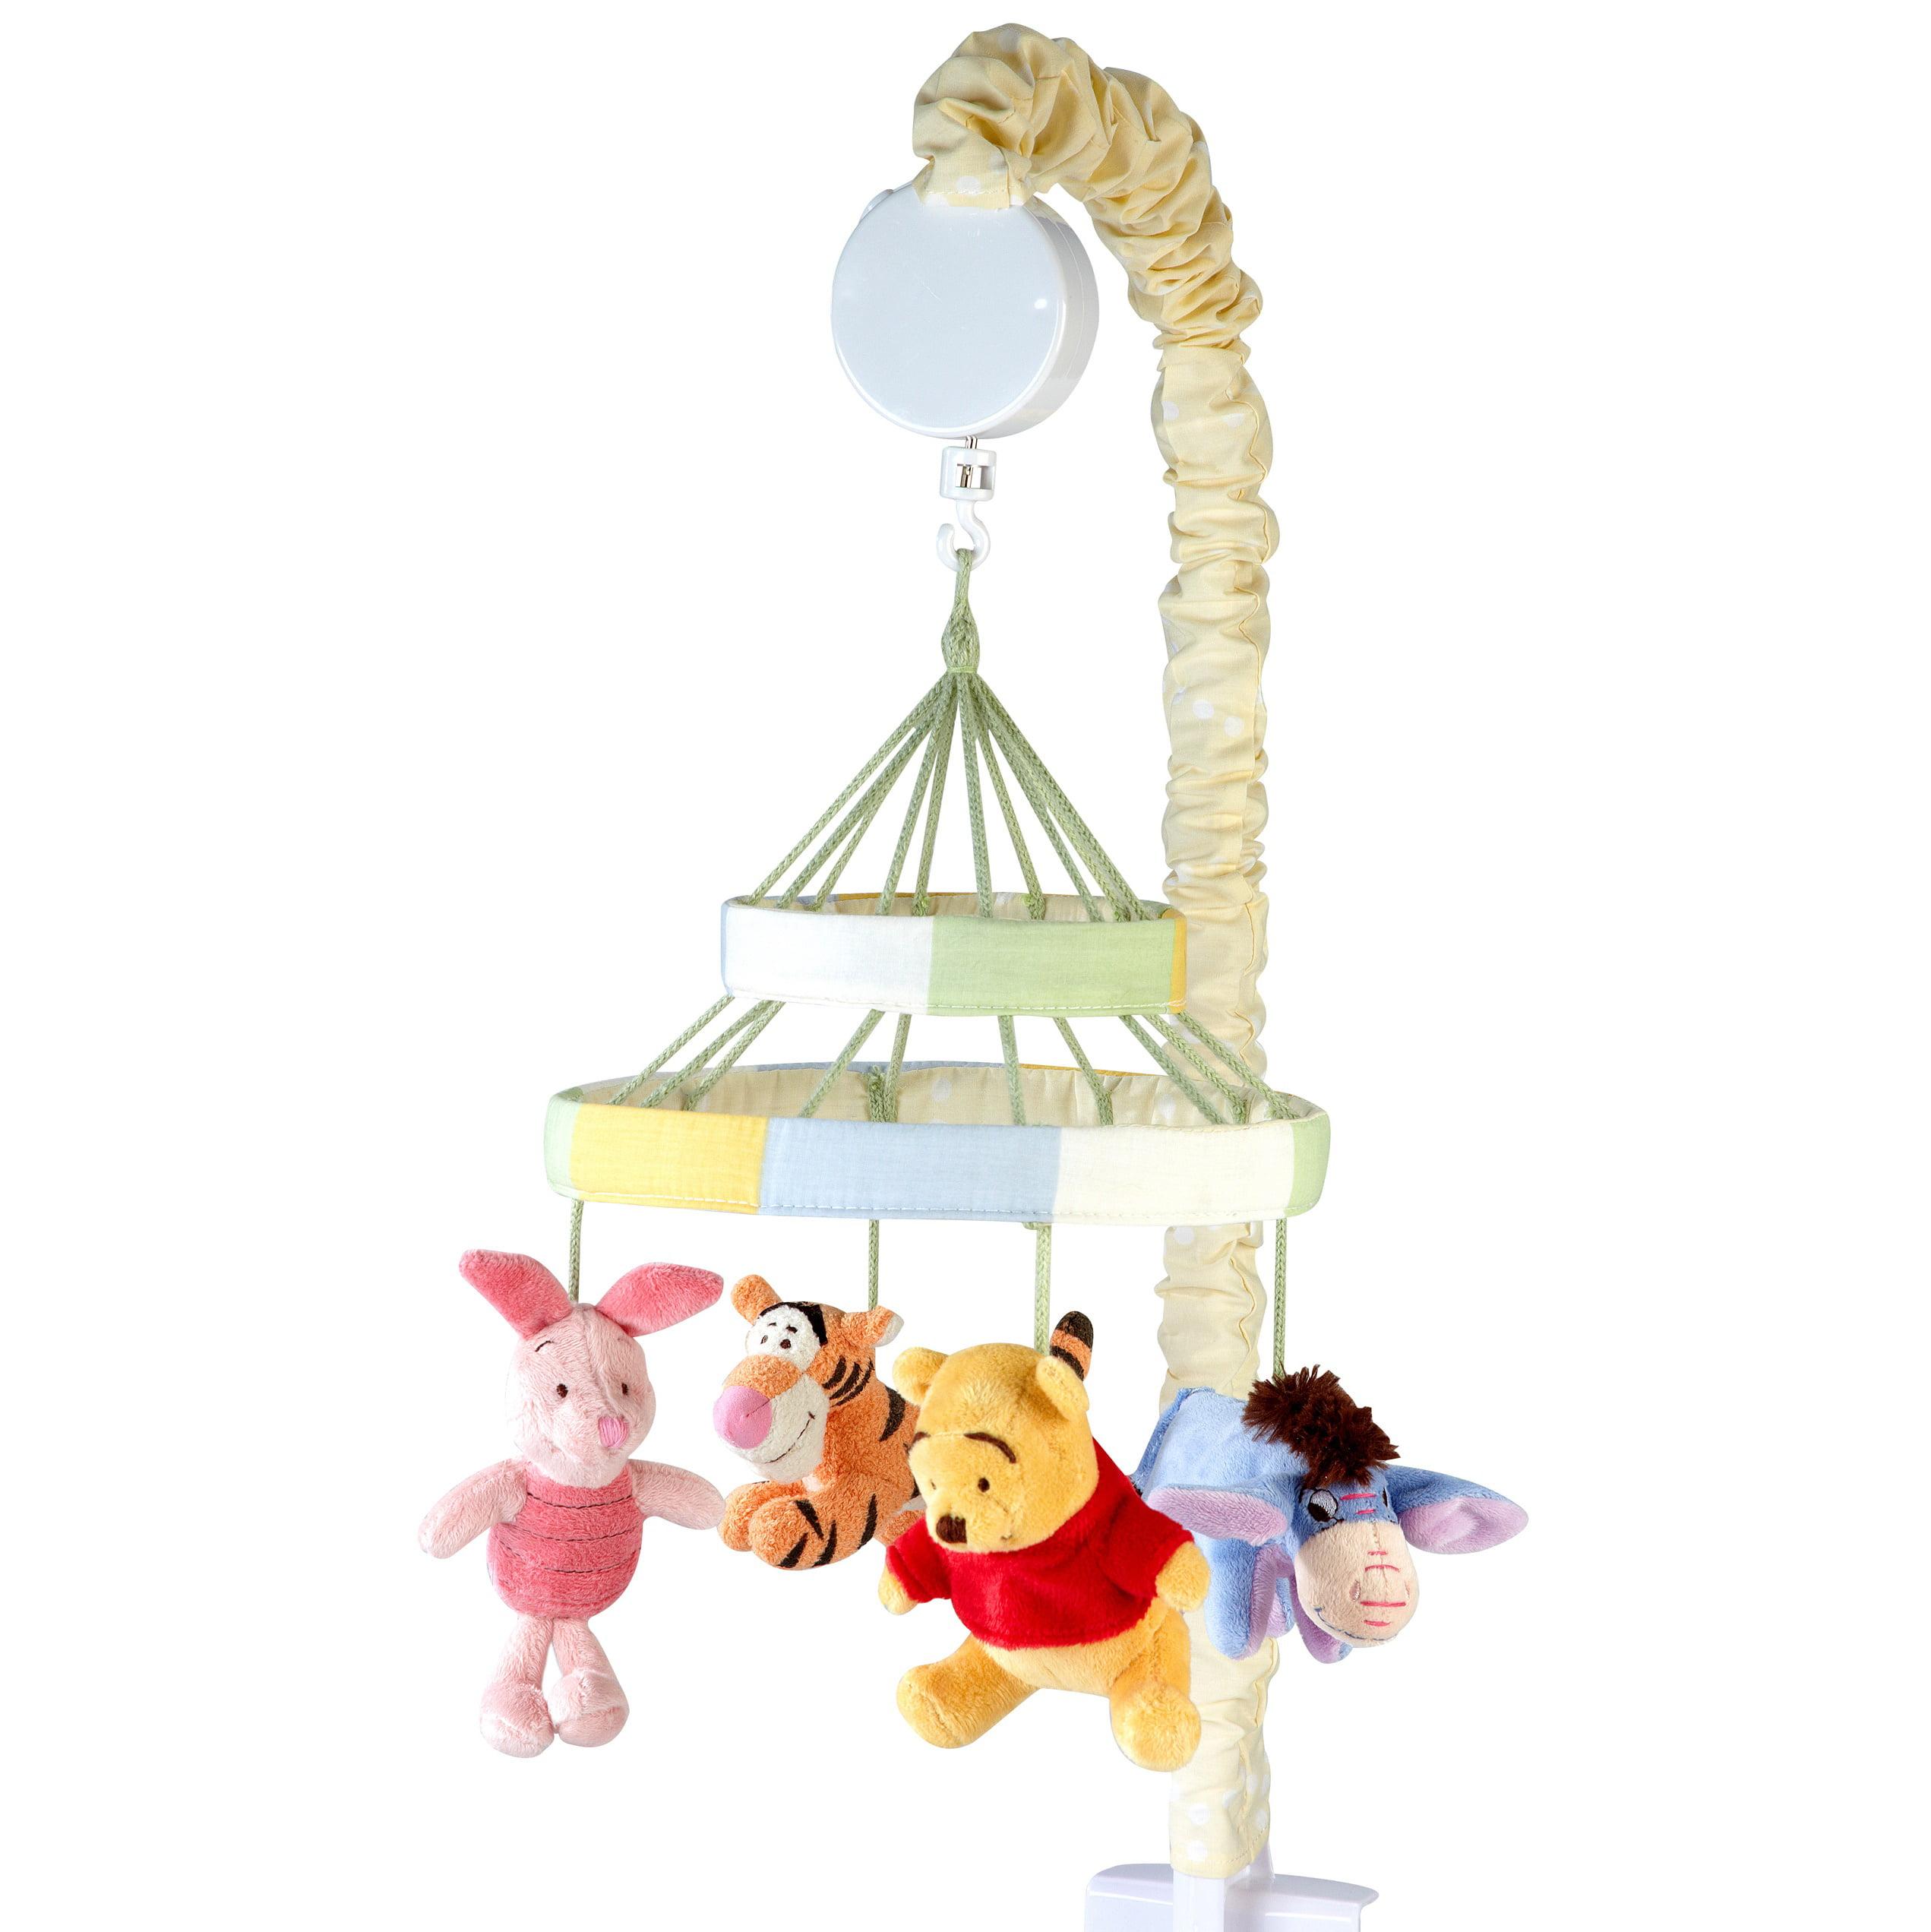 Disney Winnie the Pooh Peeking Pooh Nursery Crib Musical Mobile by Disney